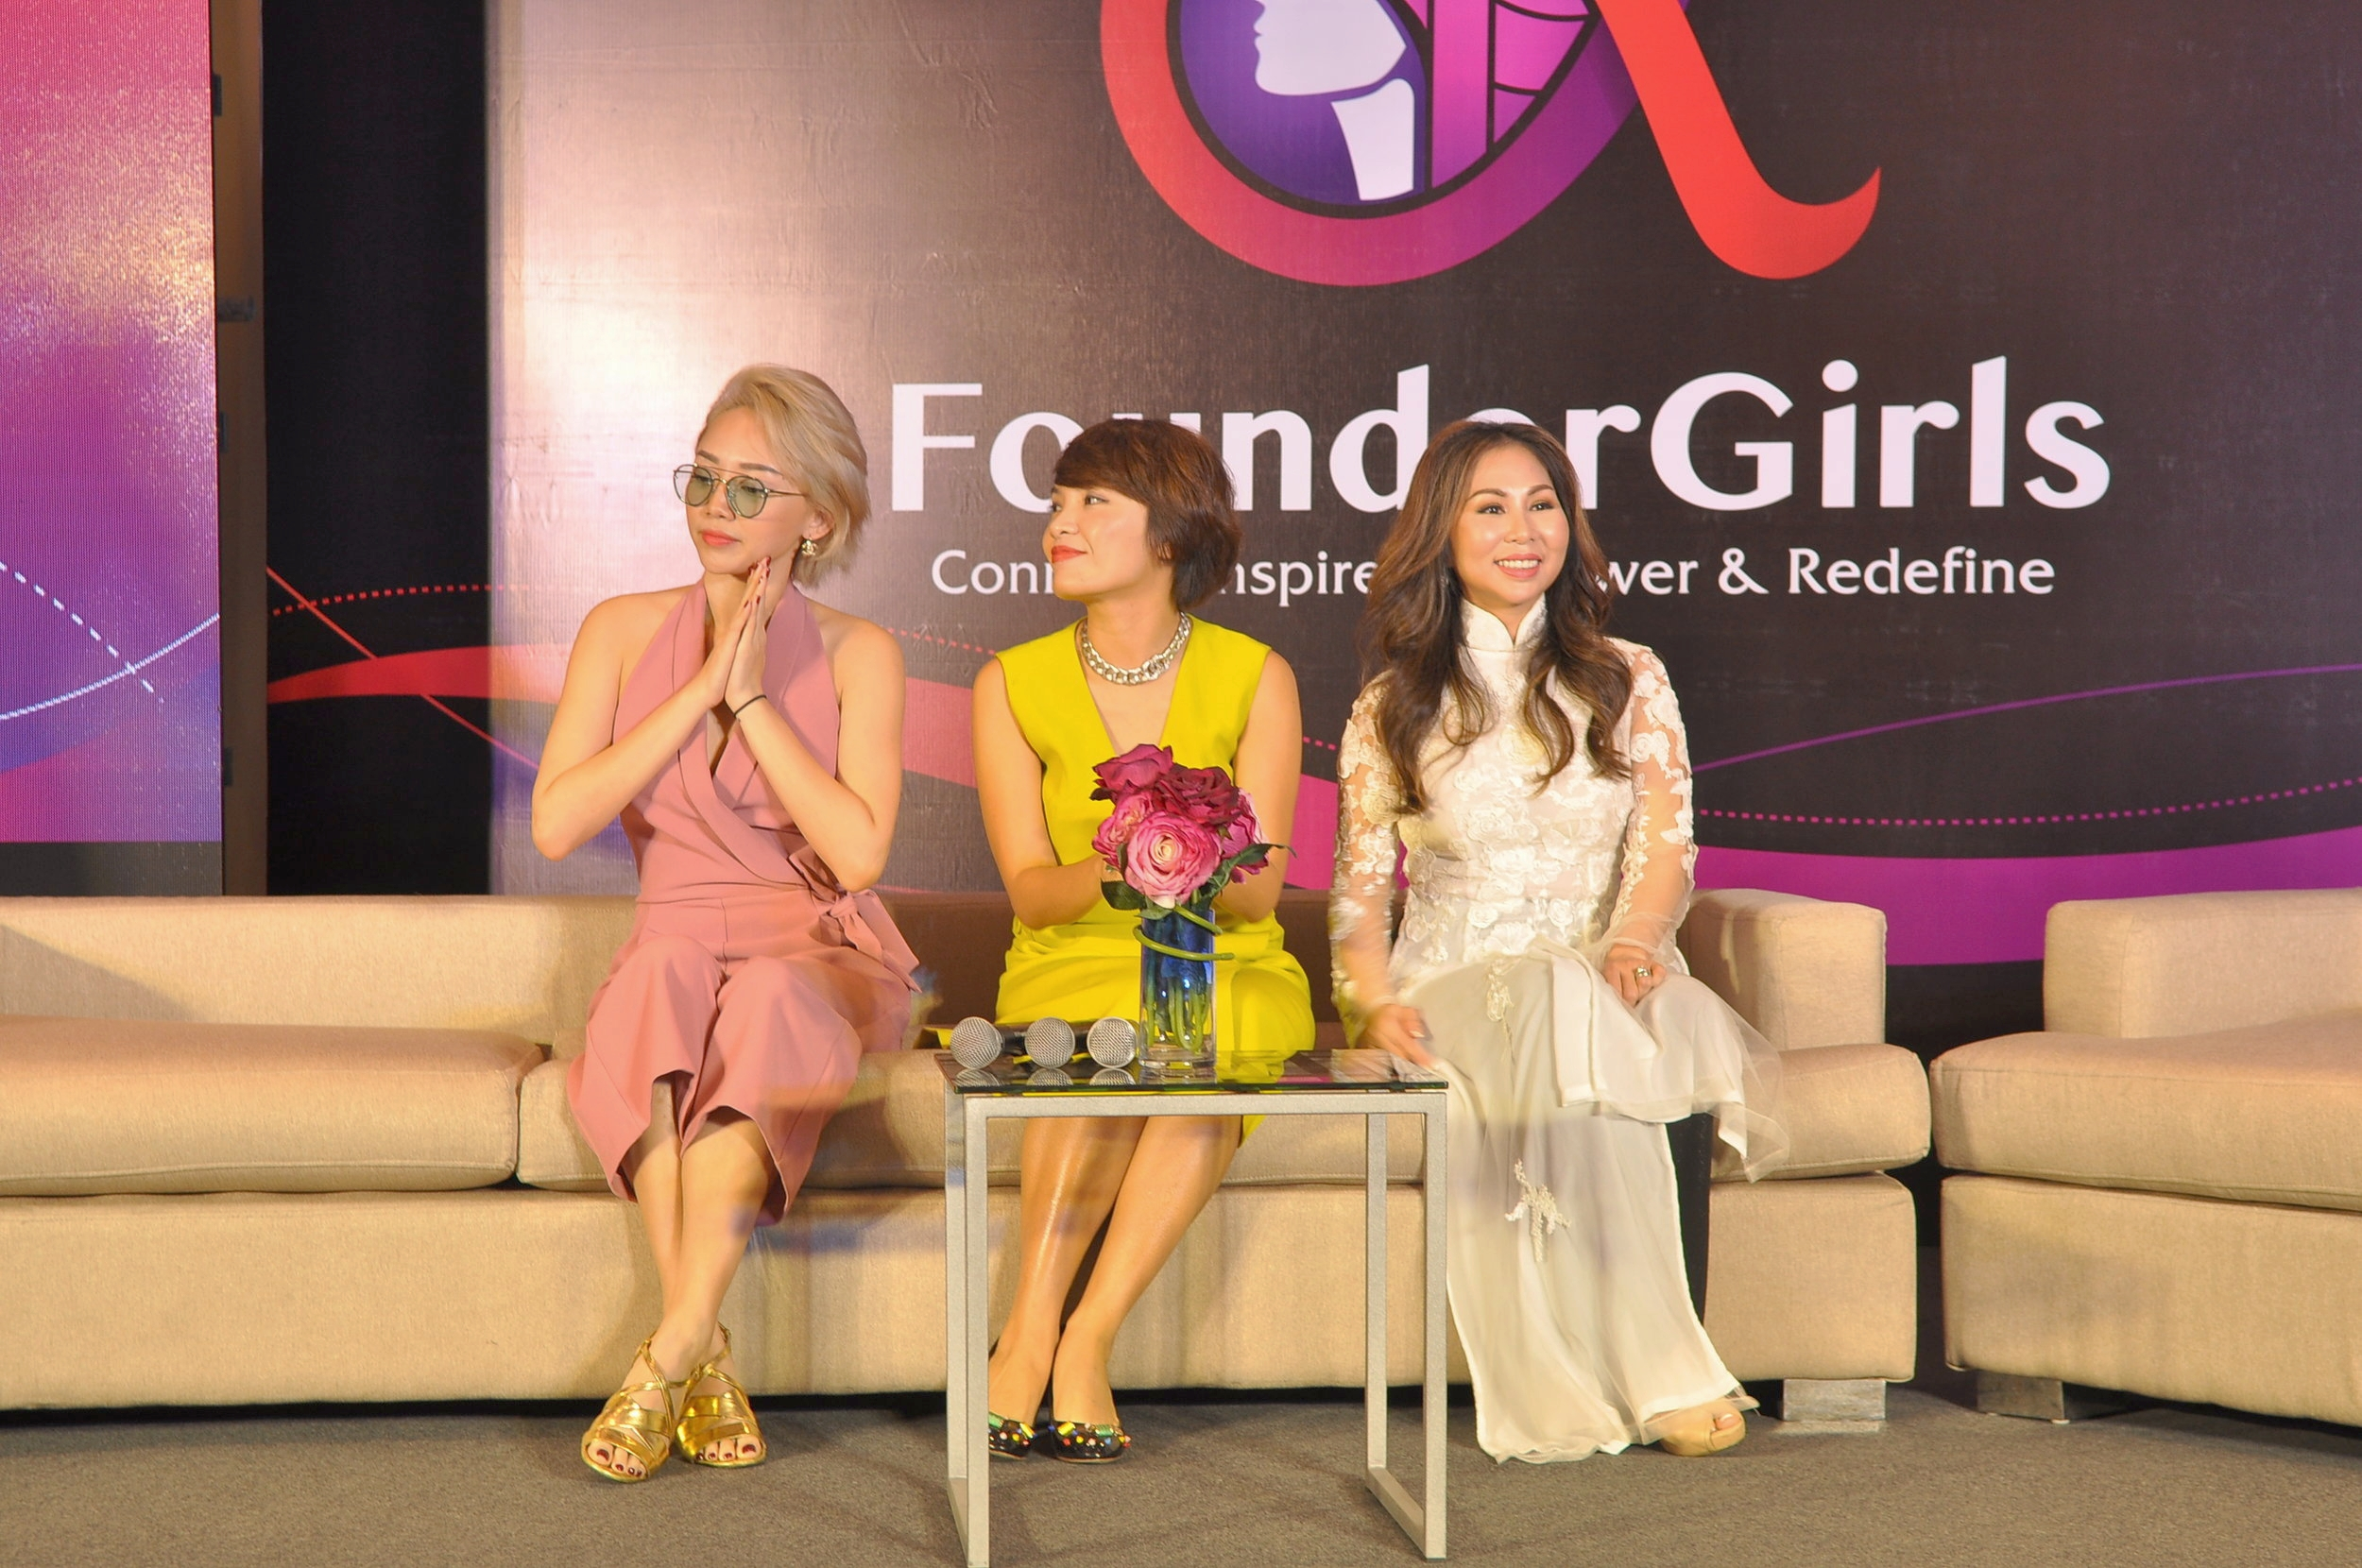 lan_bercu_founder_girls_speaker.JPG